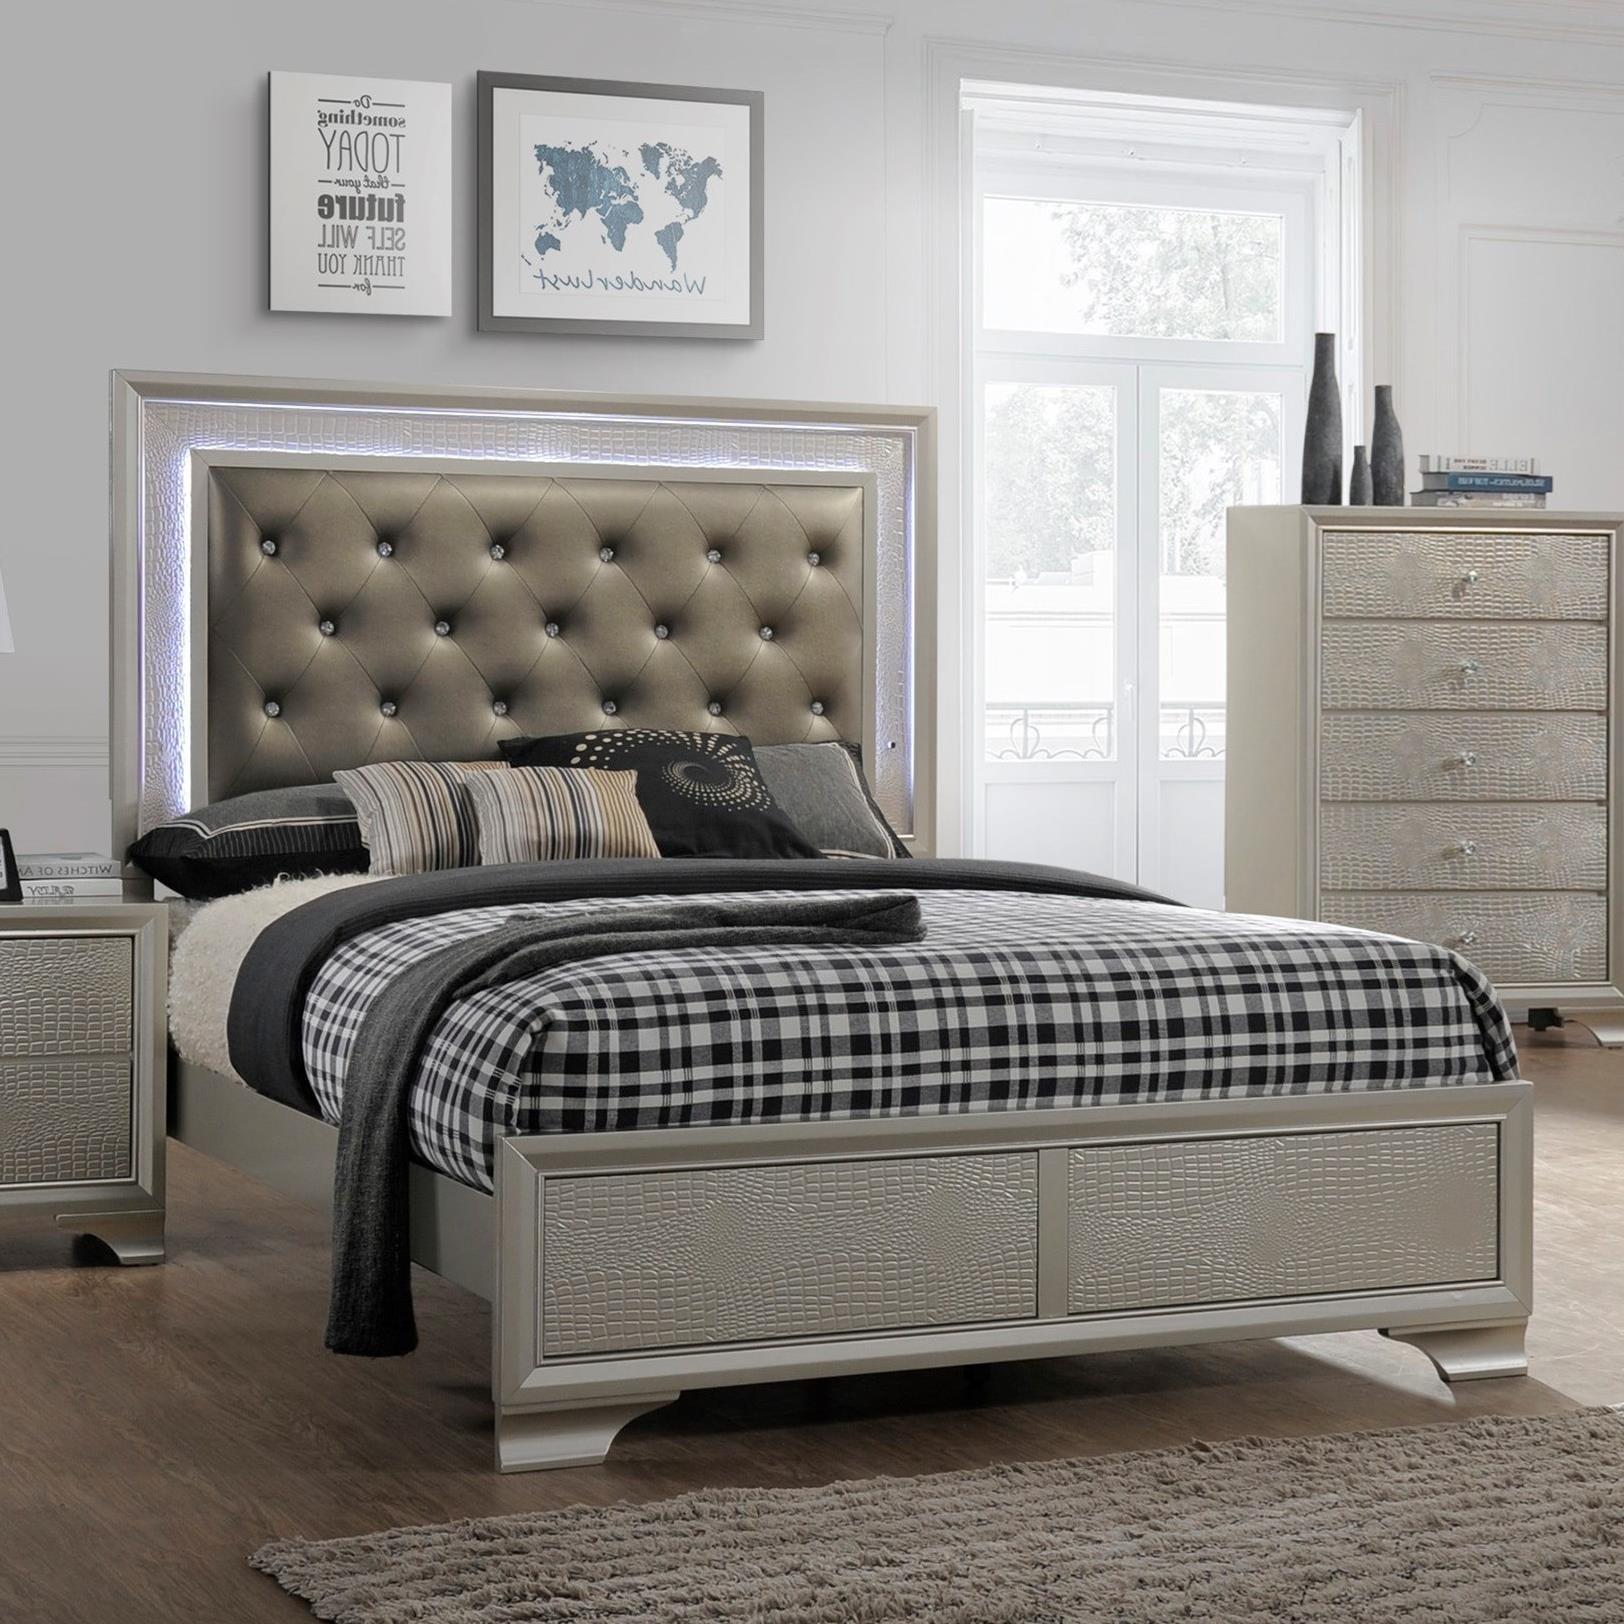 Upholstered King Bed